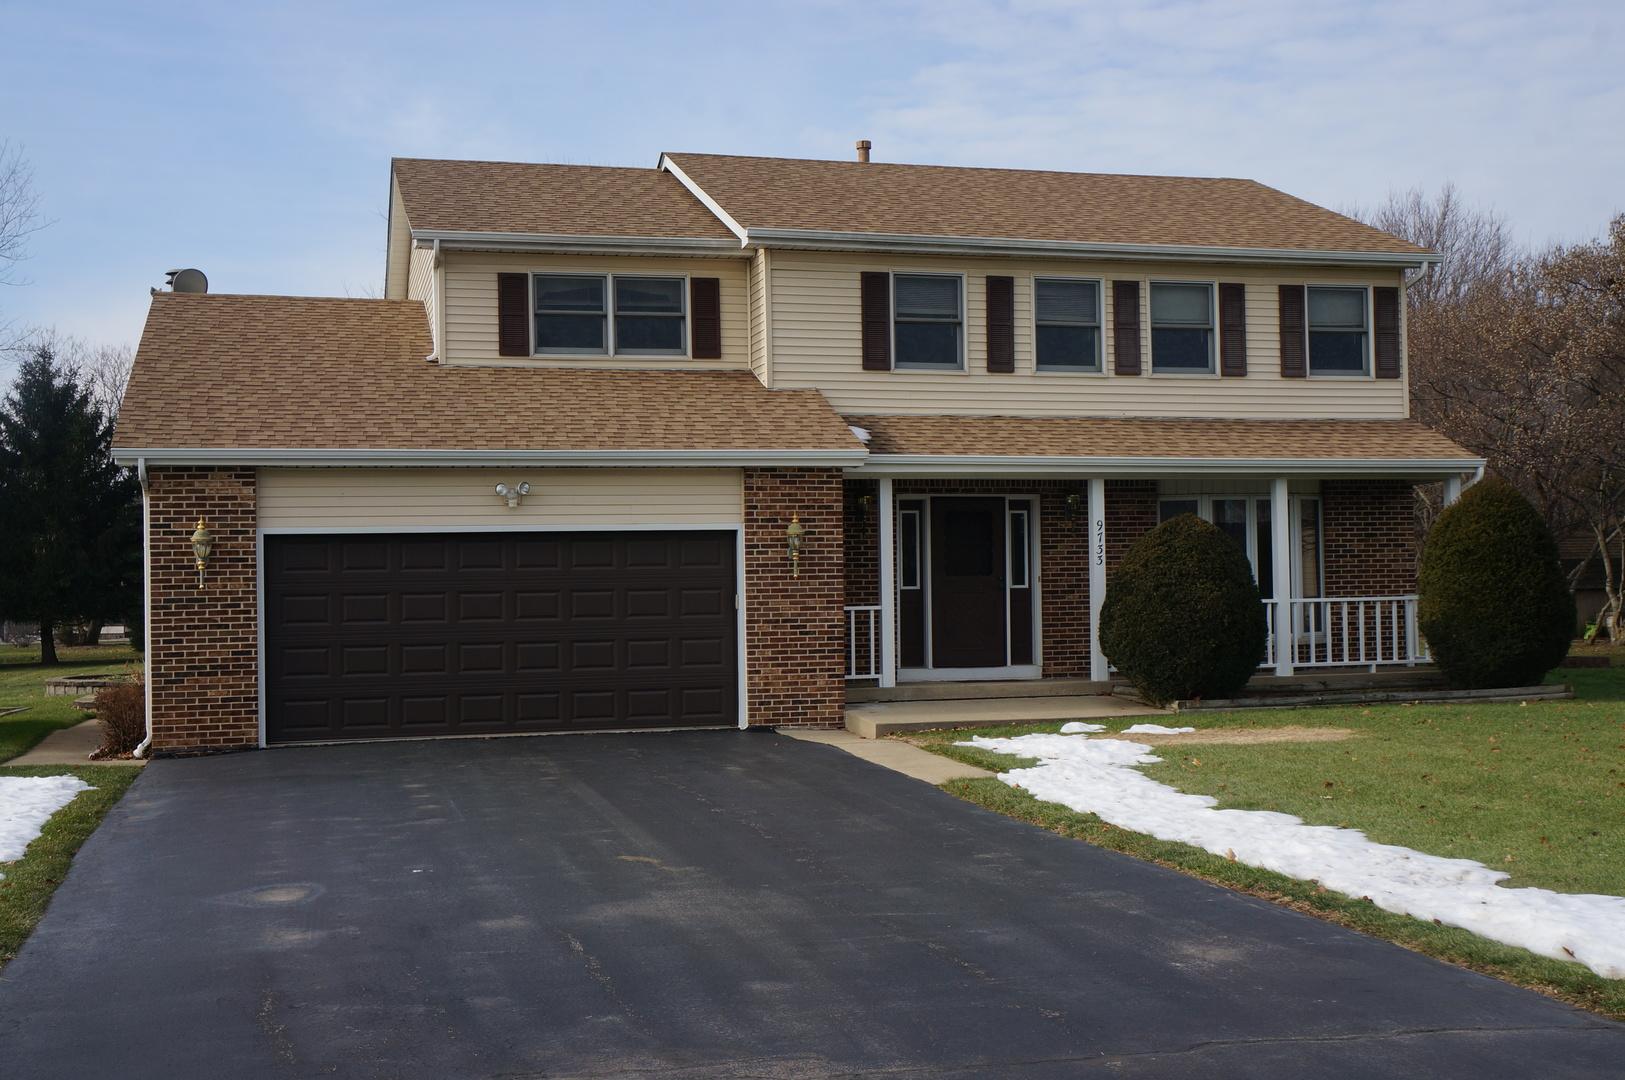 9733 N Hunters Lane, Spring Grove, IL 60081